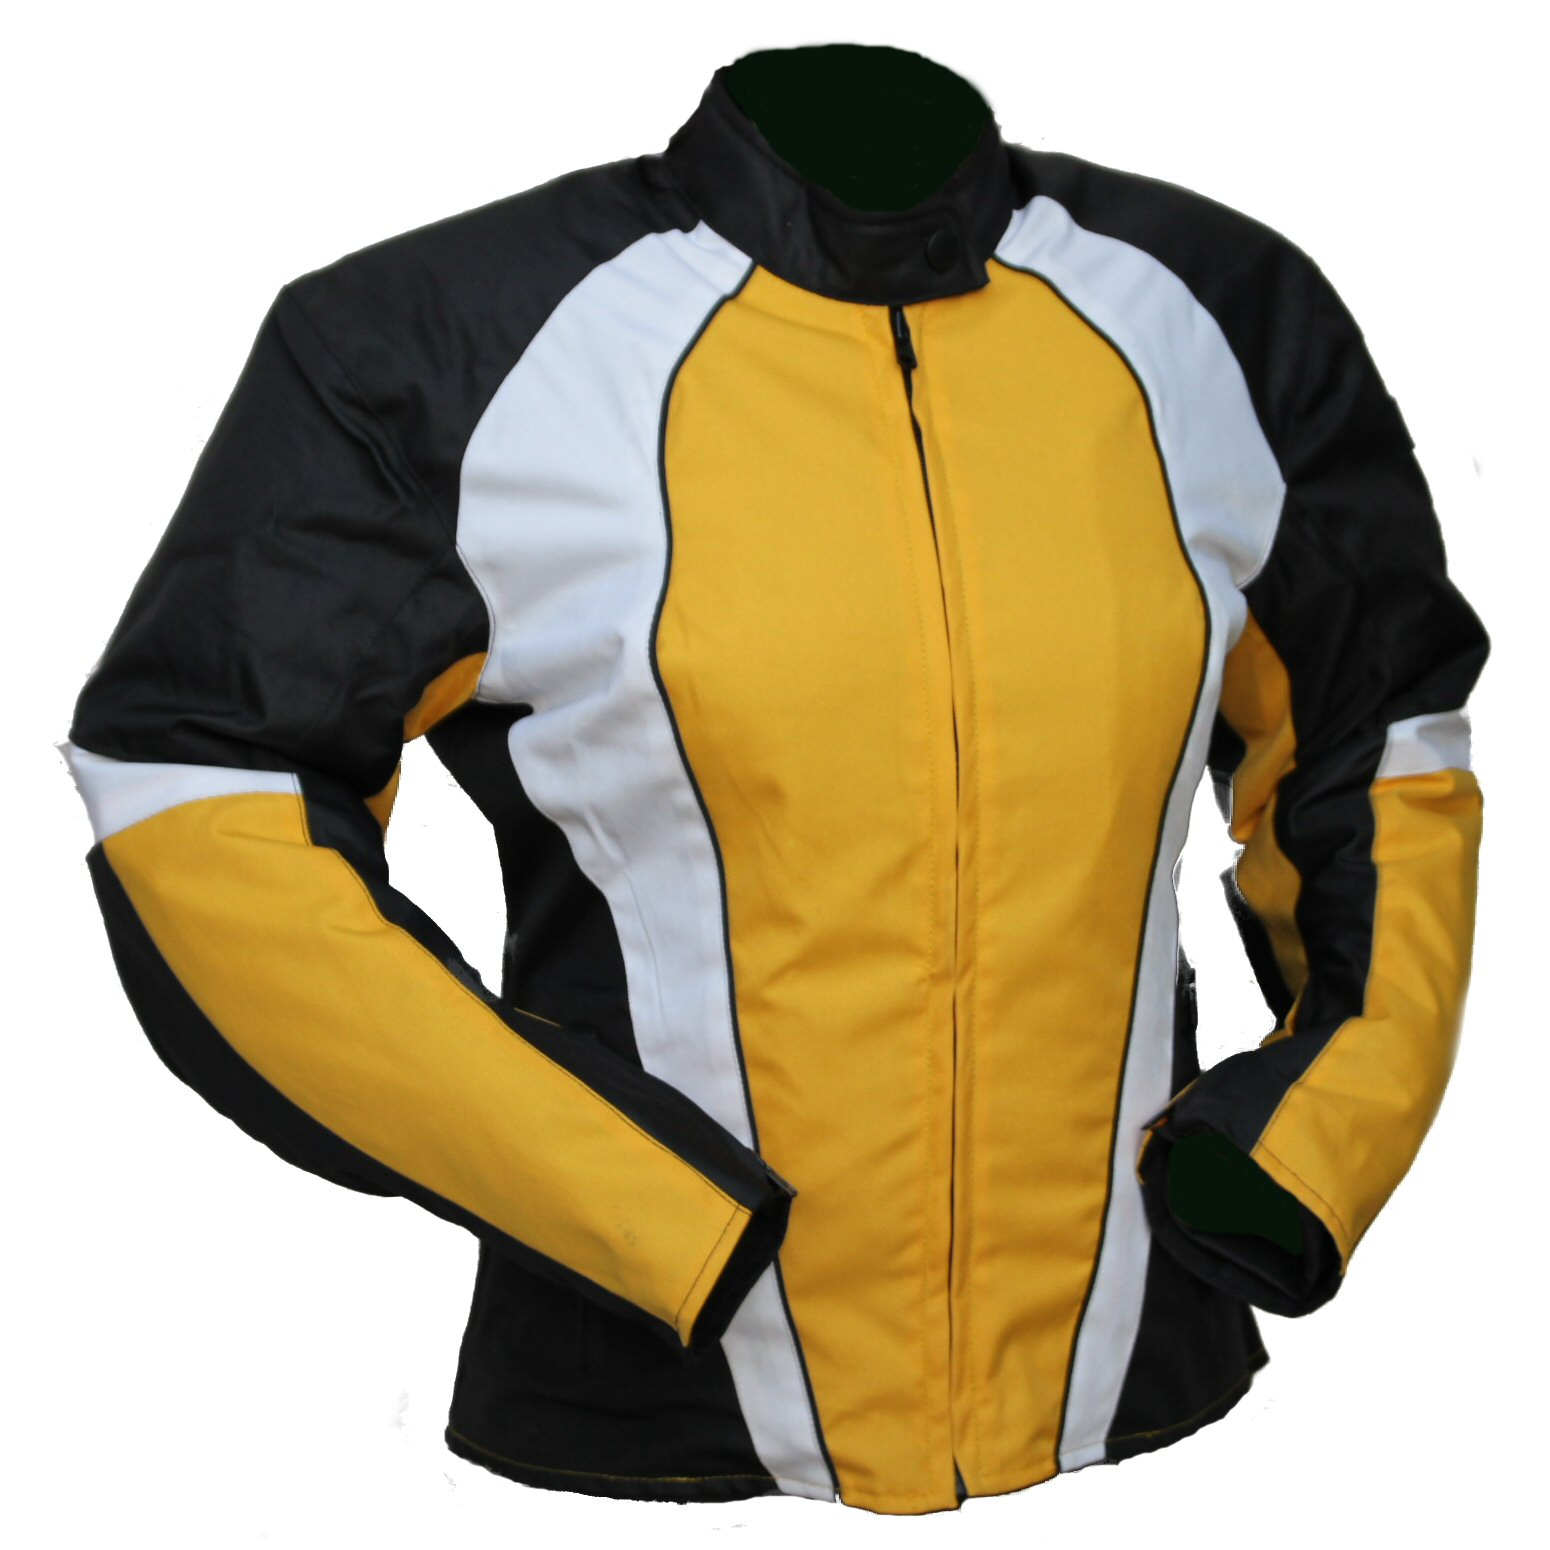 kt012 blouson moto femme karno cintr typhoon jaune doublure amovible vetement moto femme. Black Bedroom Furniture Sets. Home Design Ideas